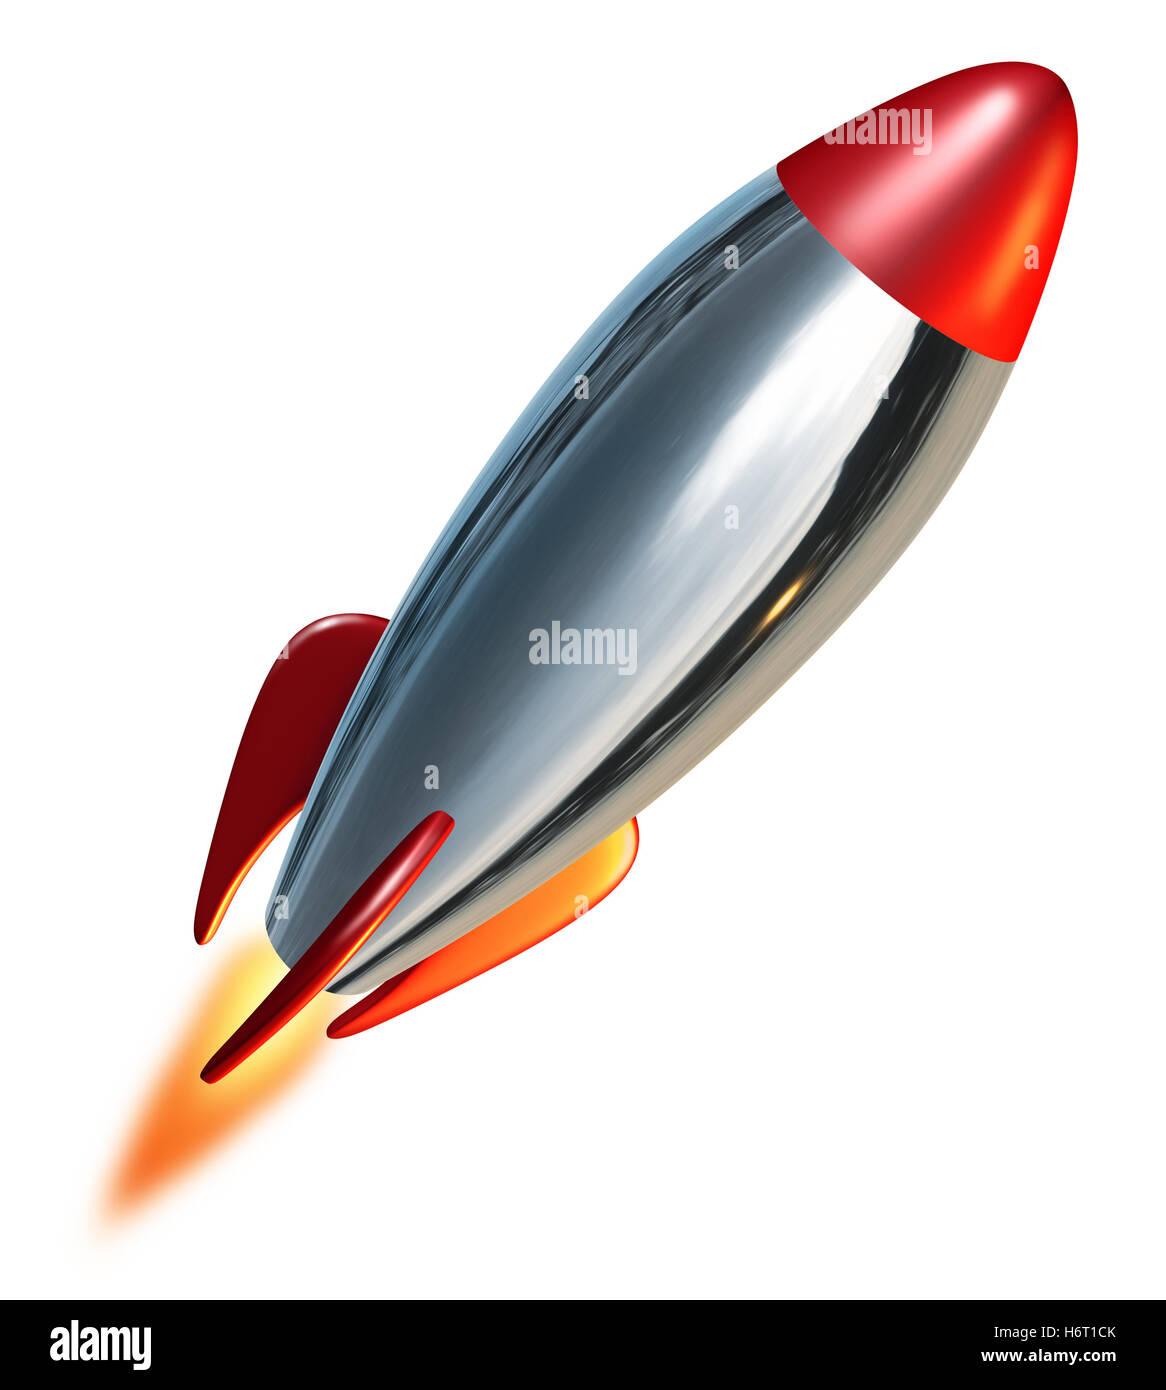 space flight vehicle flame flames upward thrust rocket combustion missile exploration blast off spaceflight rocketry - Stock Image